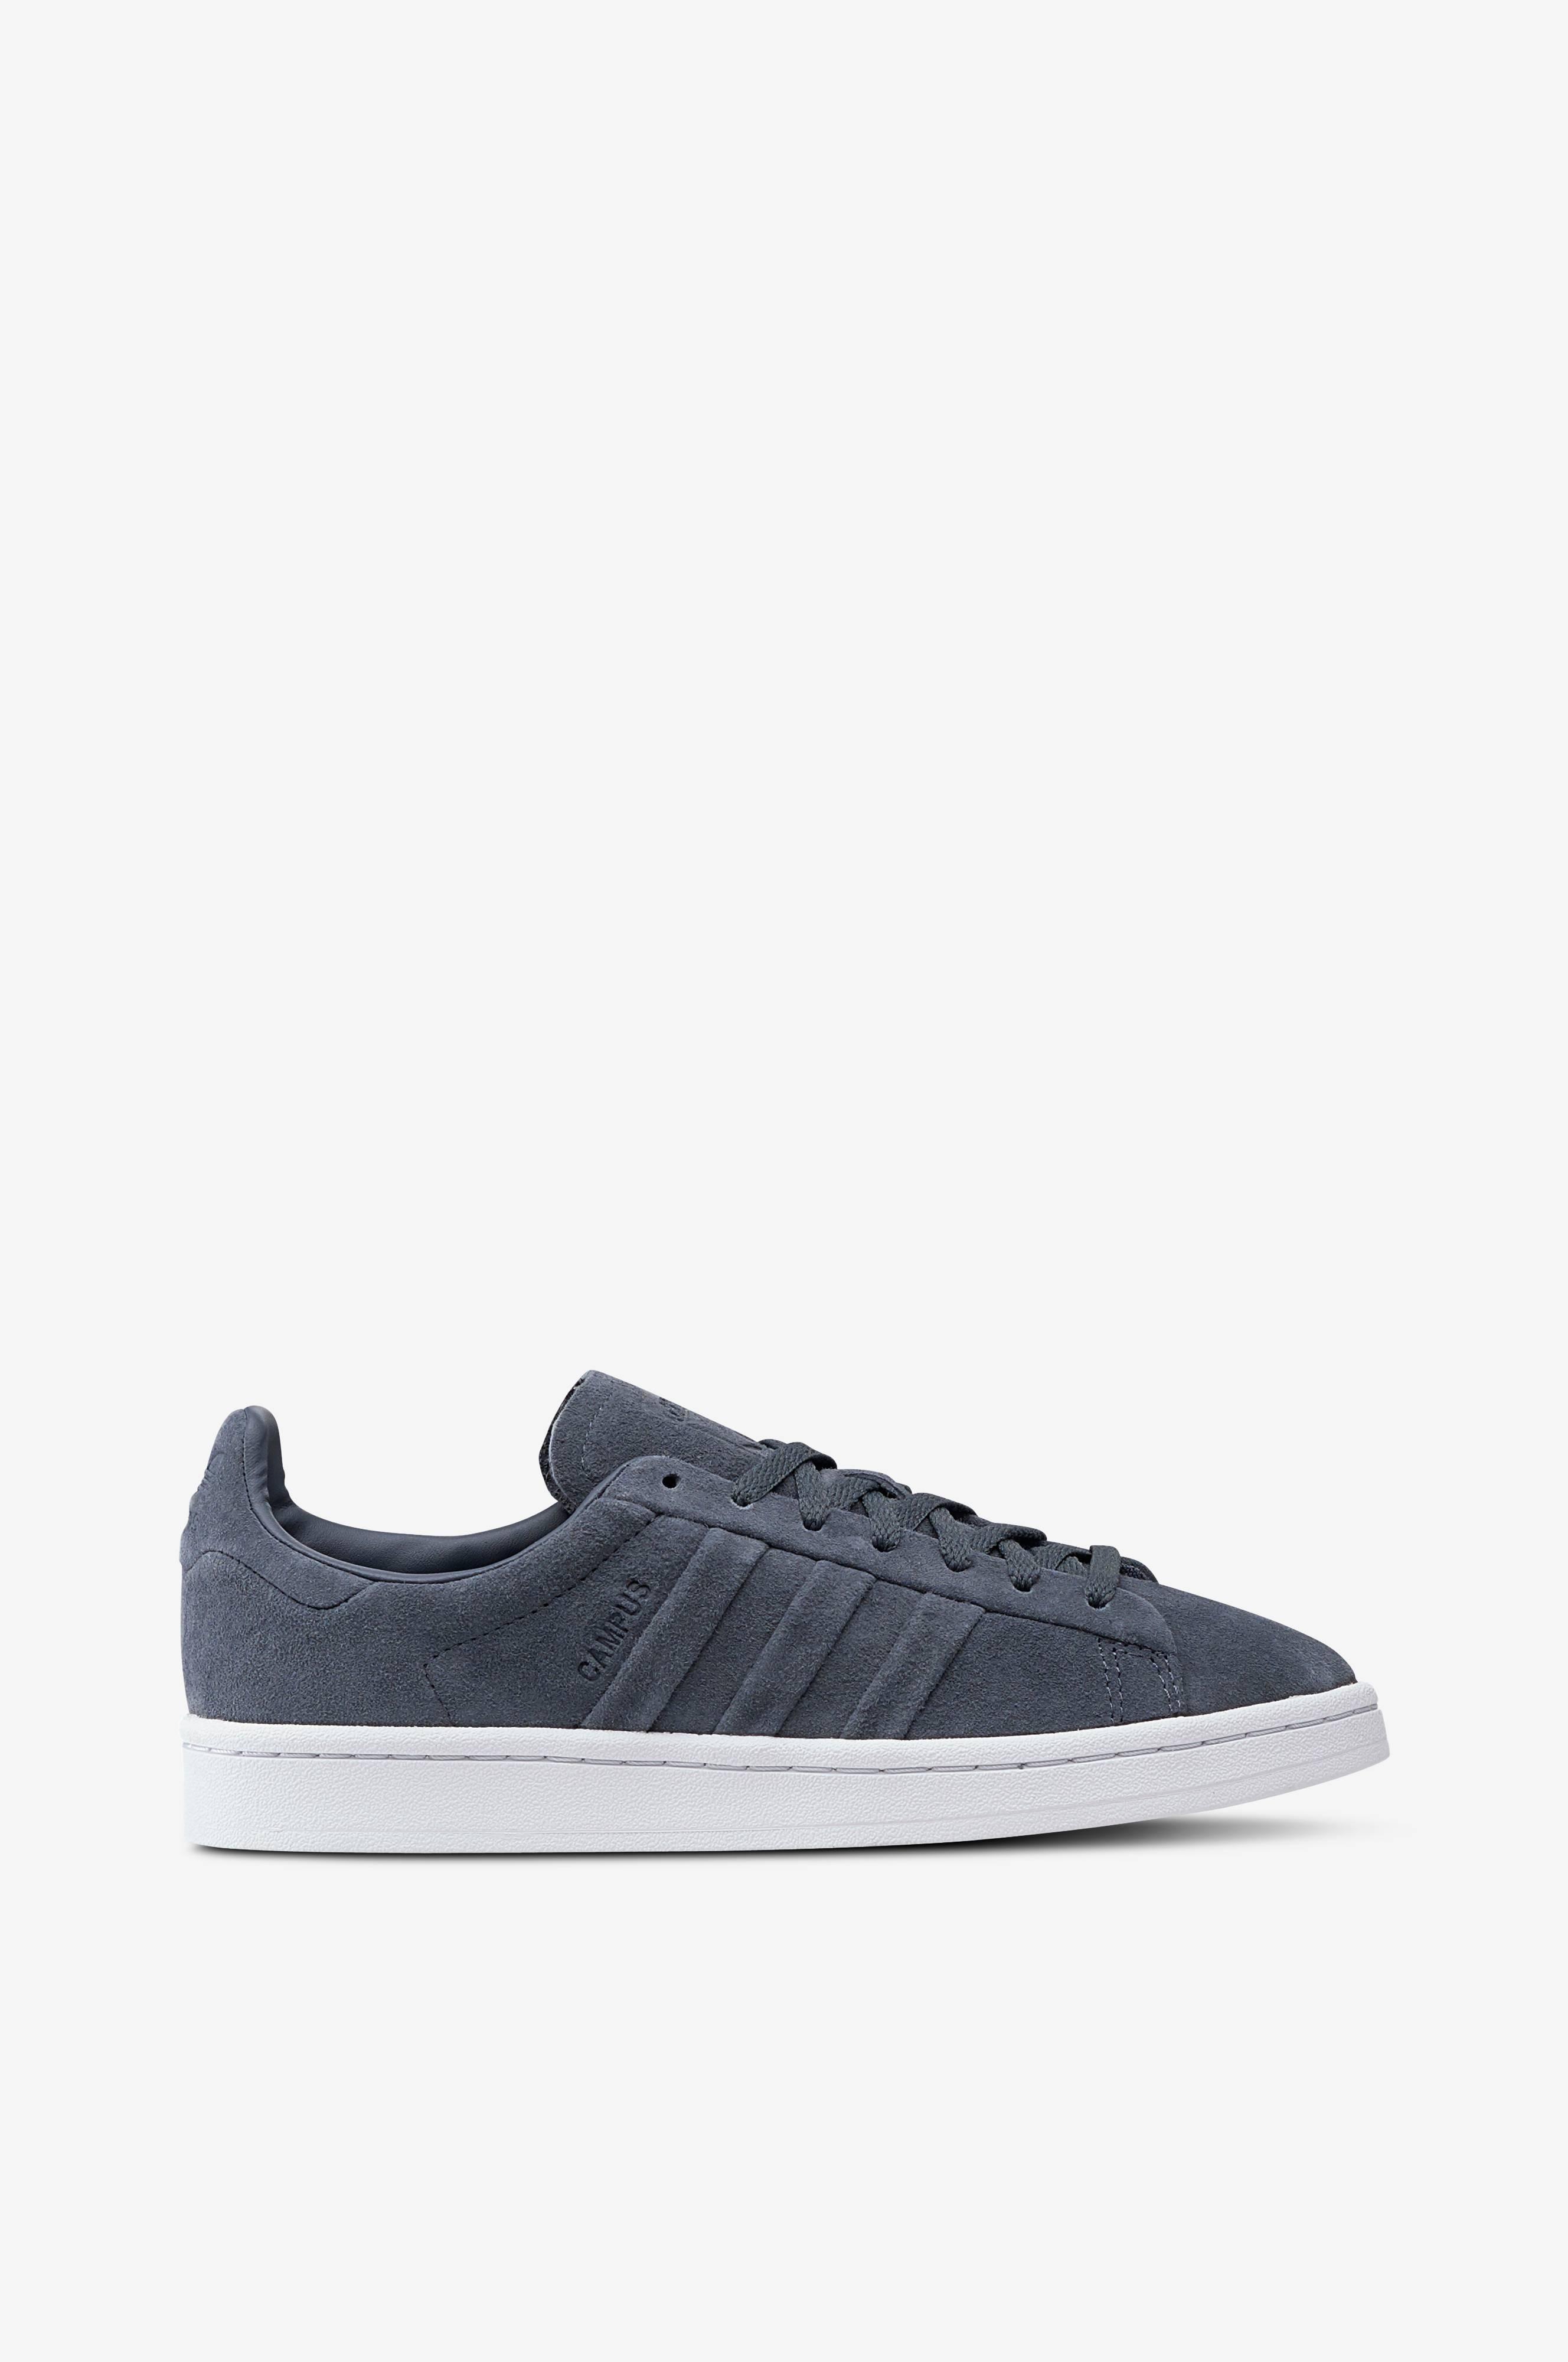 buy online ef02f afe64 adidas Originals Campus Stitch and Turn- tennarit - Harmaa - Naiset -  Ellos.fi